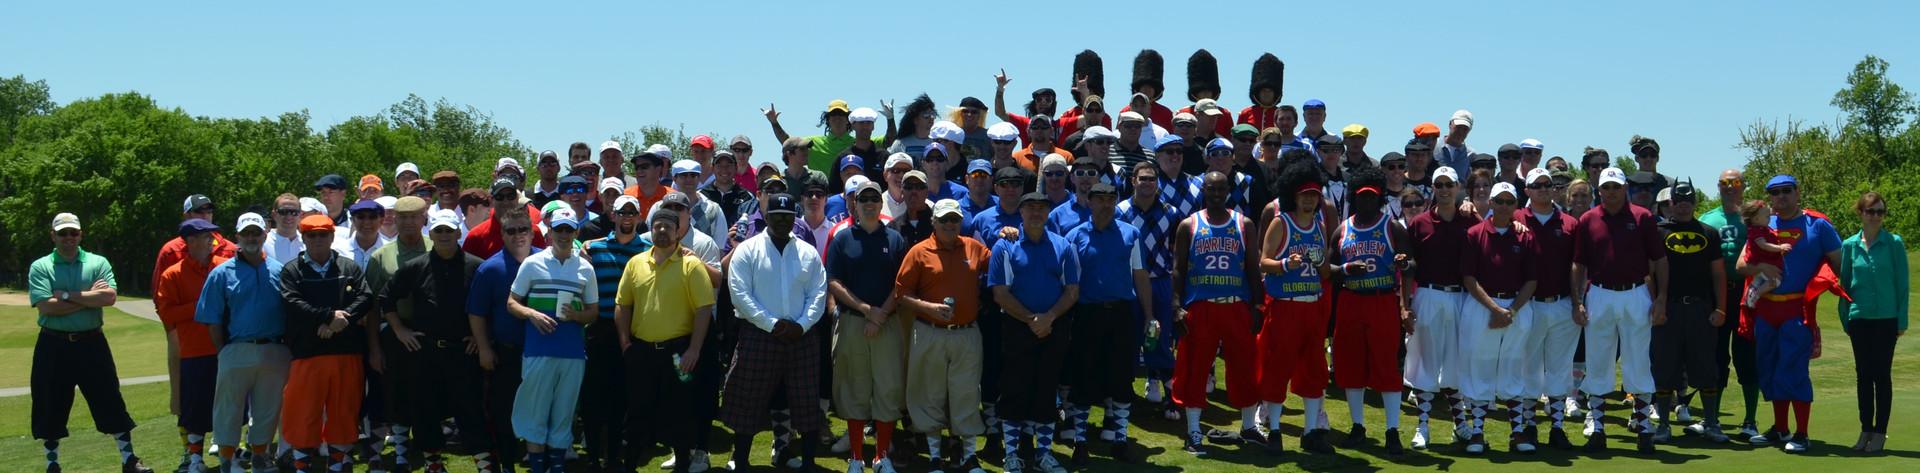 2013 Group Pic.jpg